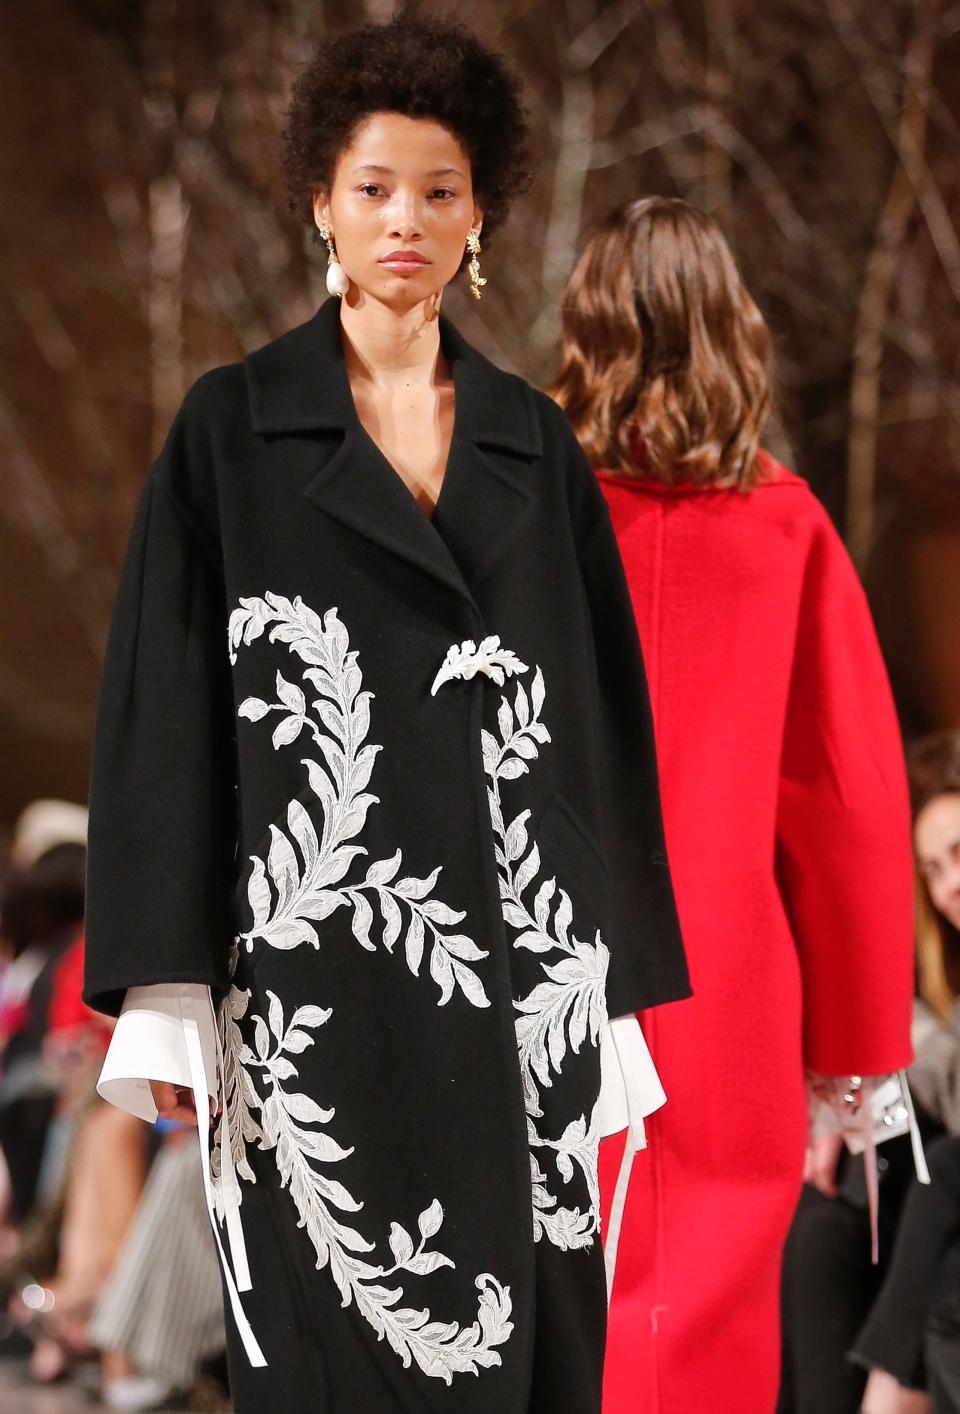 Fashion from Oscar de la Renta is modeled during Fashion Week, Monday Feb. 12, 2018, in New York. (AP Photo/Bebeto Matthews)